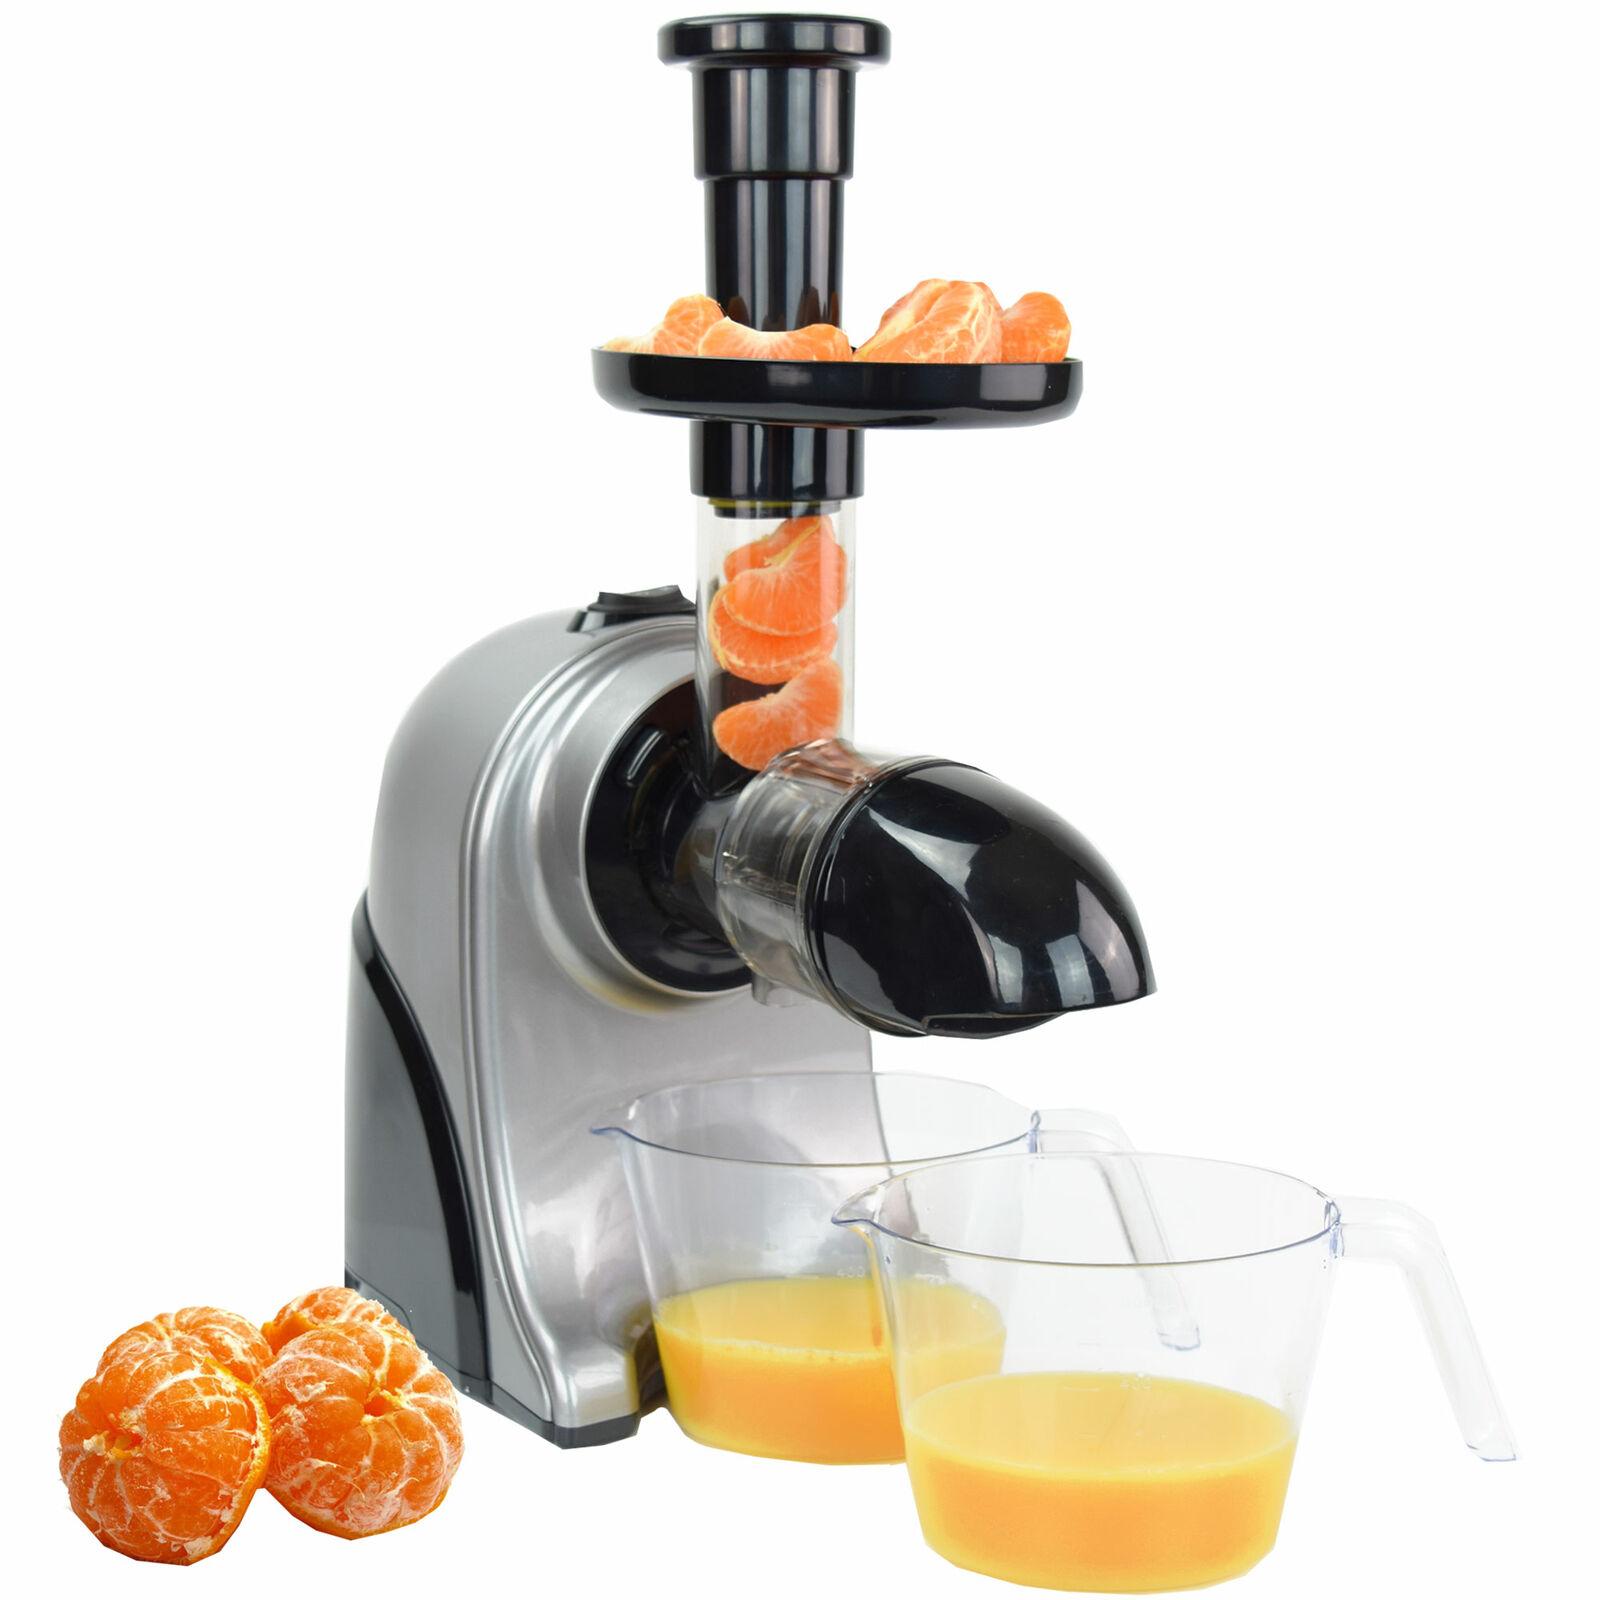 Syntrox Sj-150w-dc Slow Juice Extractor, Slow Juicer